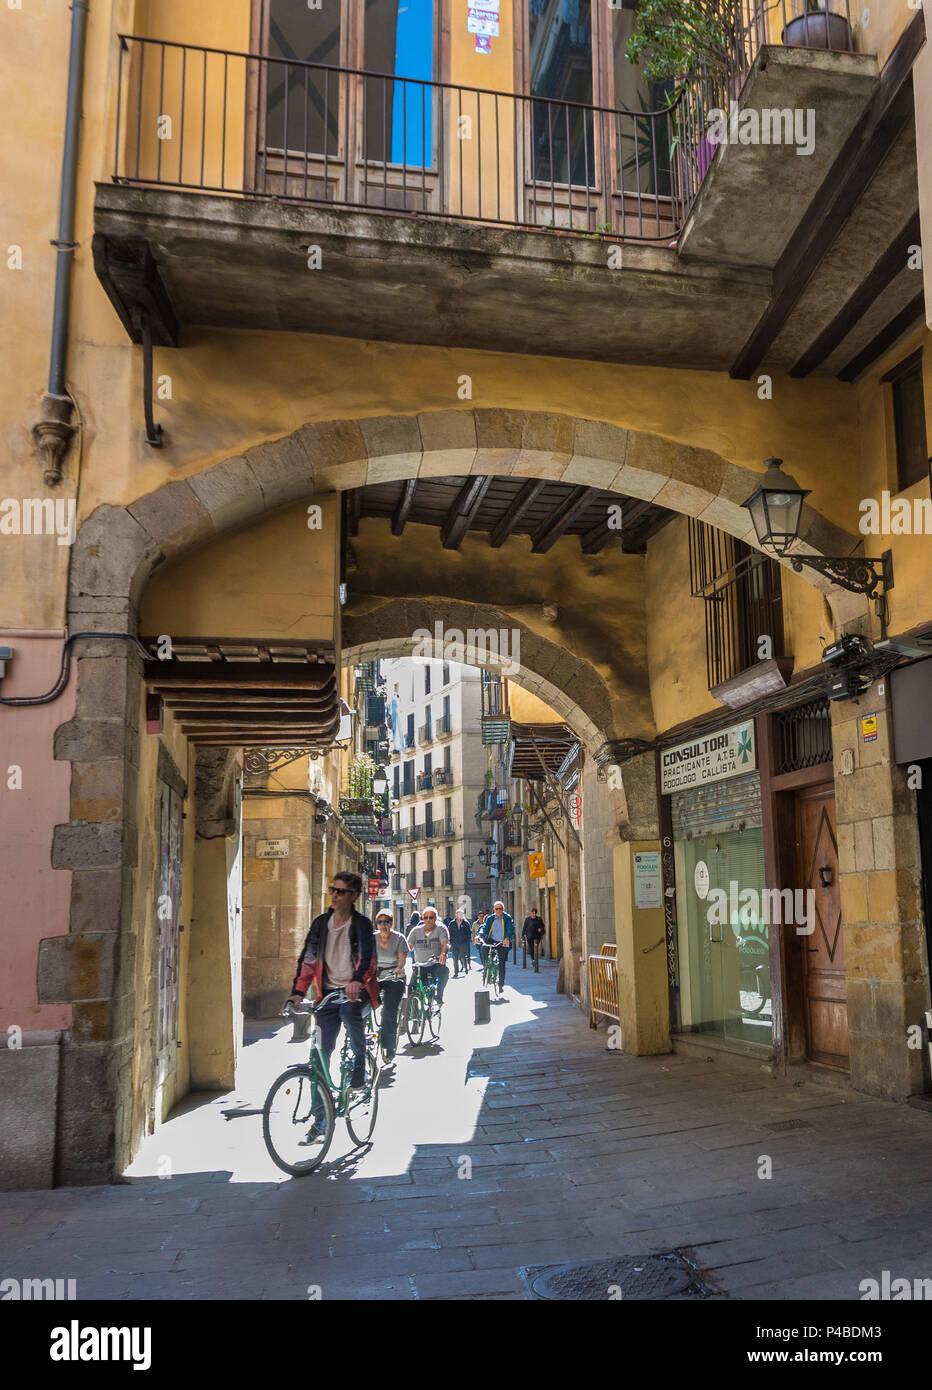 Spain, Barcelona city, ciutat vella, el rabal area, - Stock Image